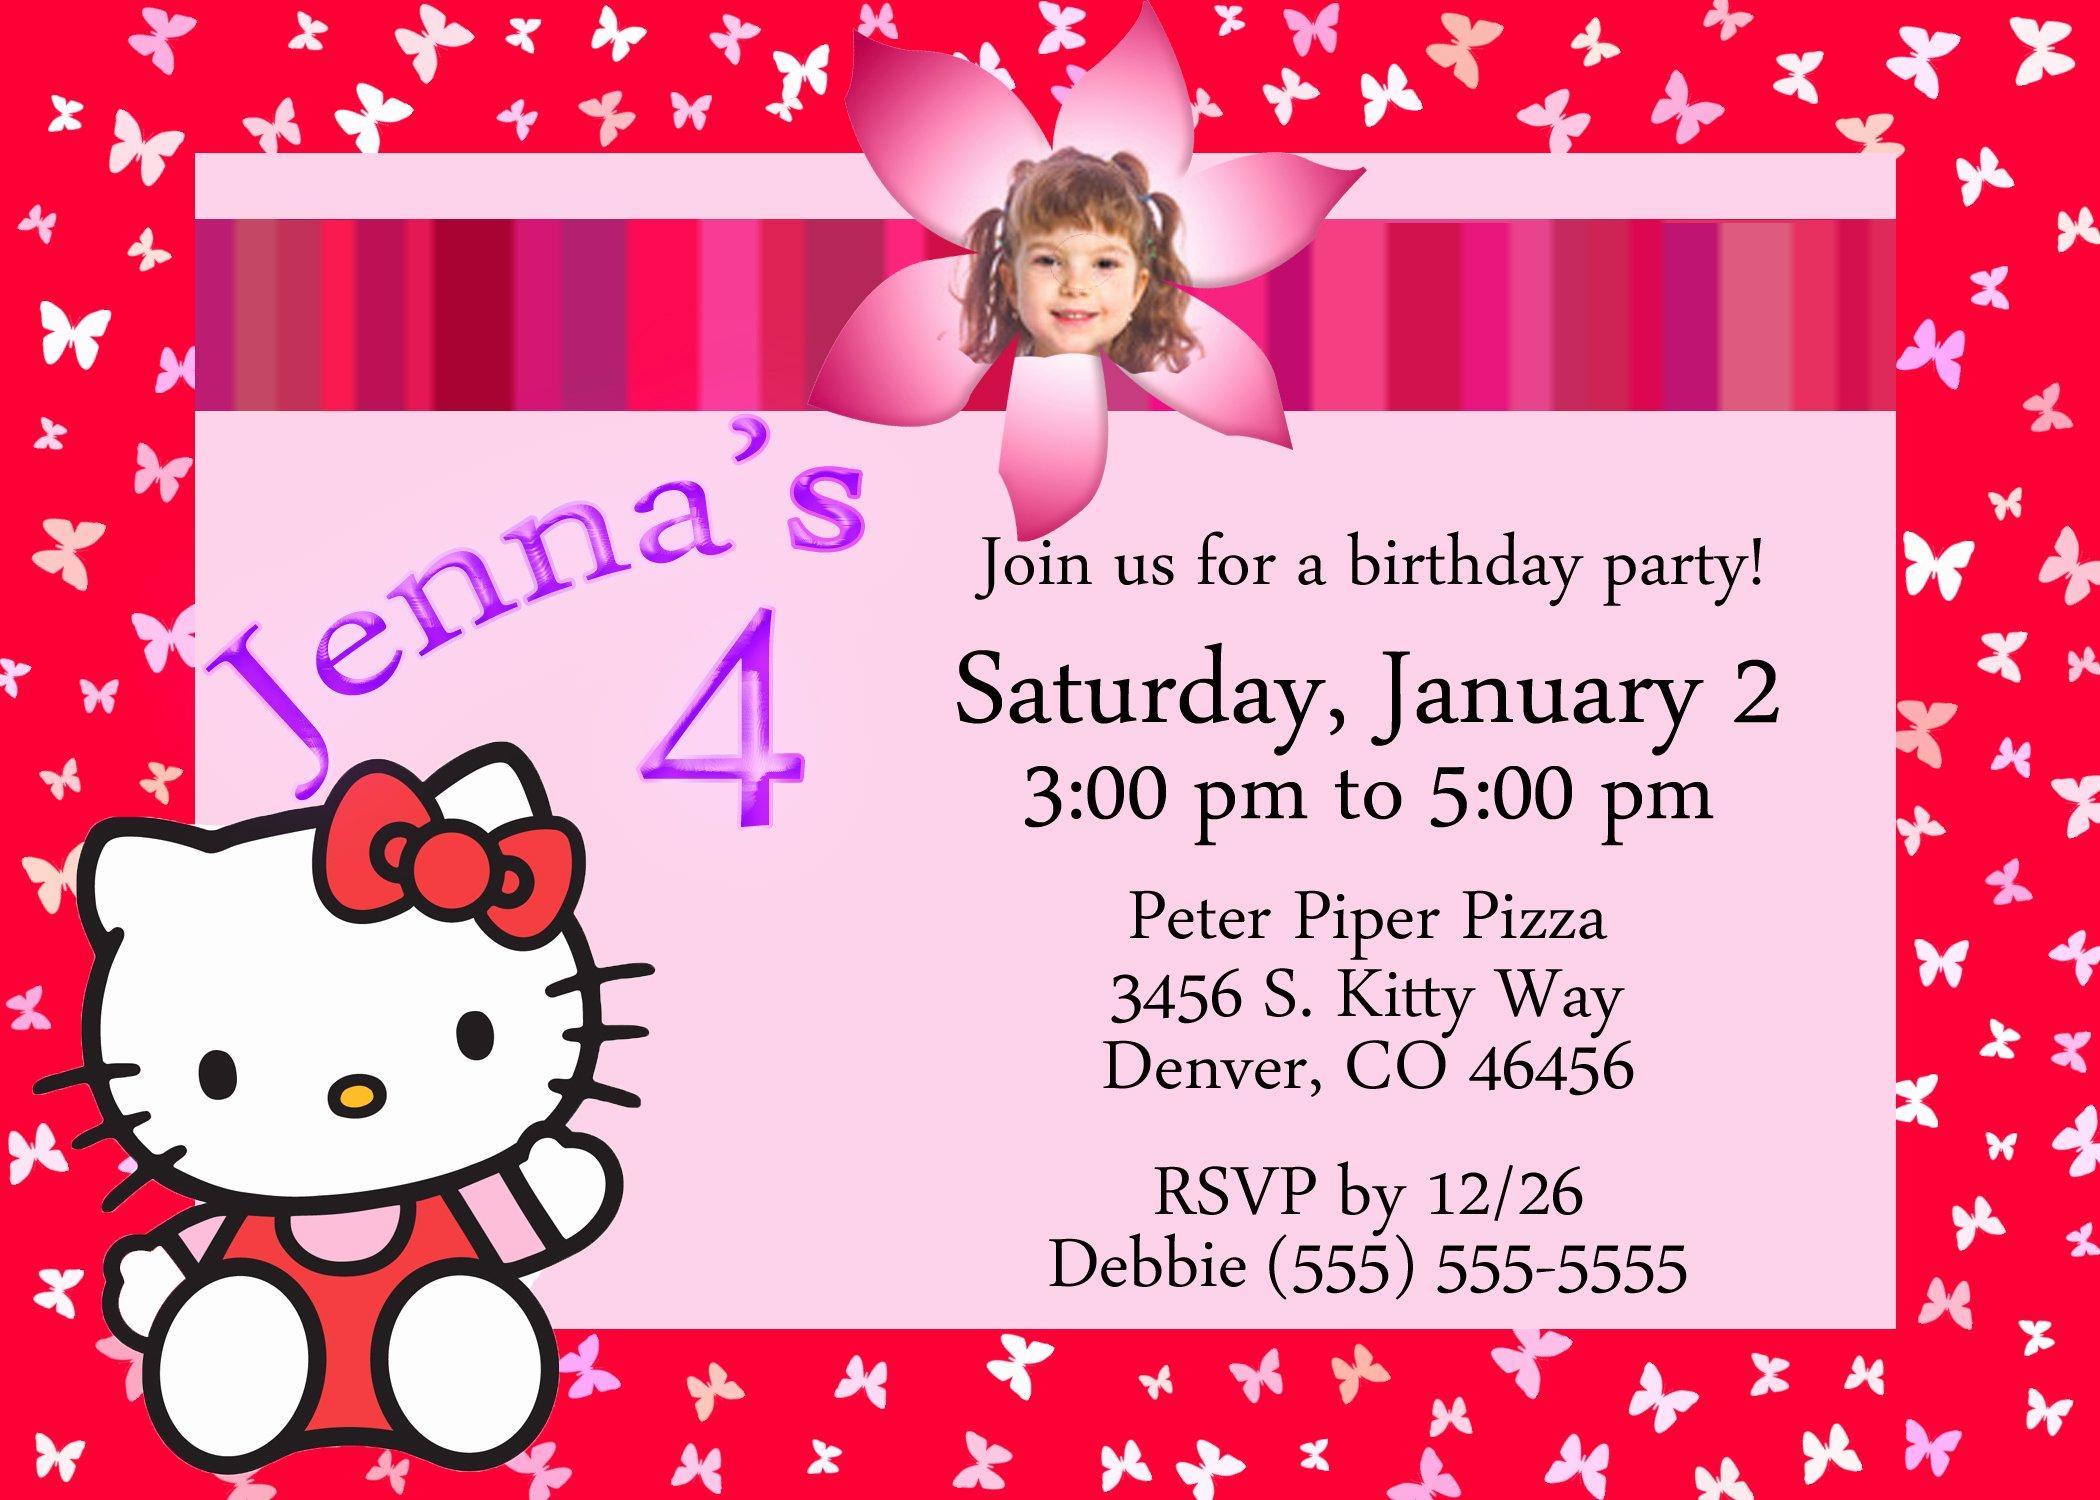 Personalized Hello Kitty Birthday Invitations Luxury Hello Kitty Birthday Invitation